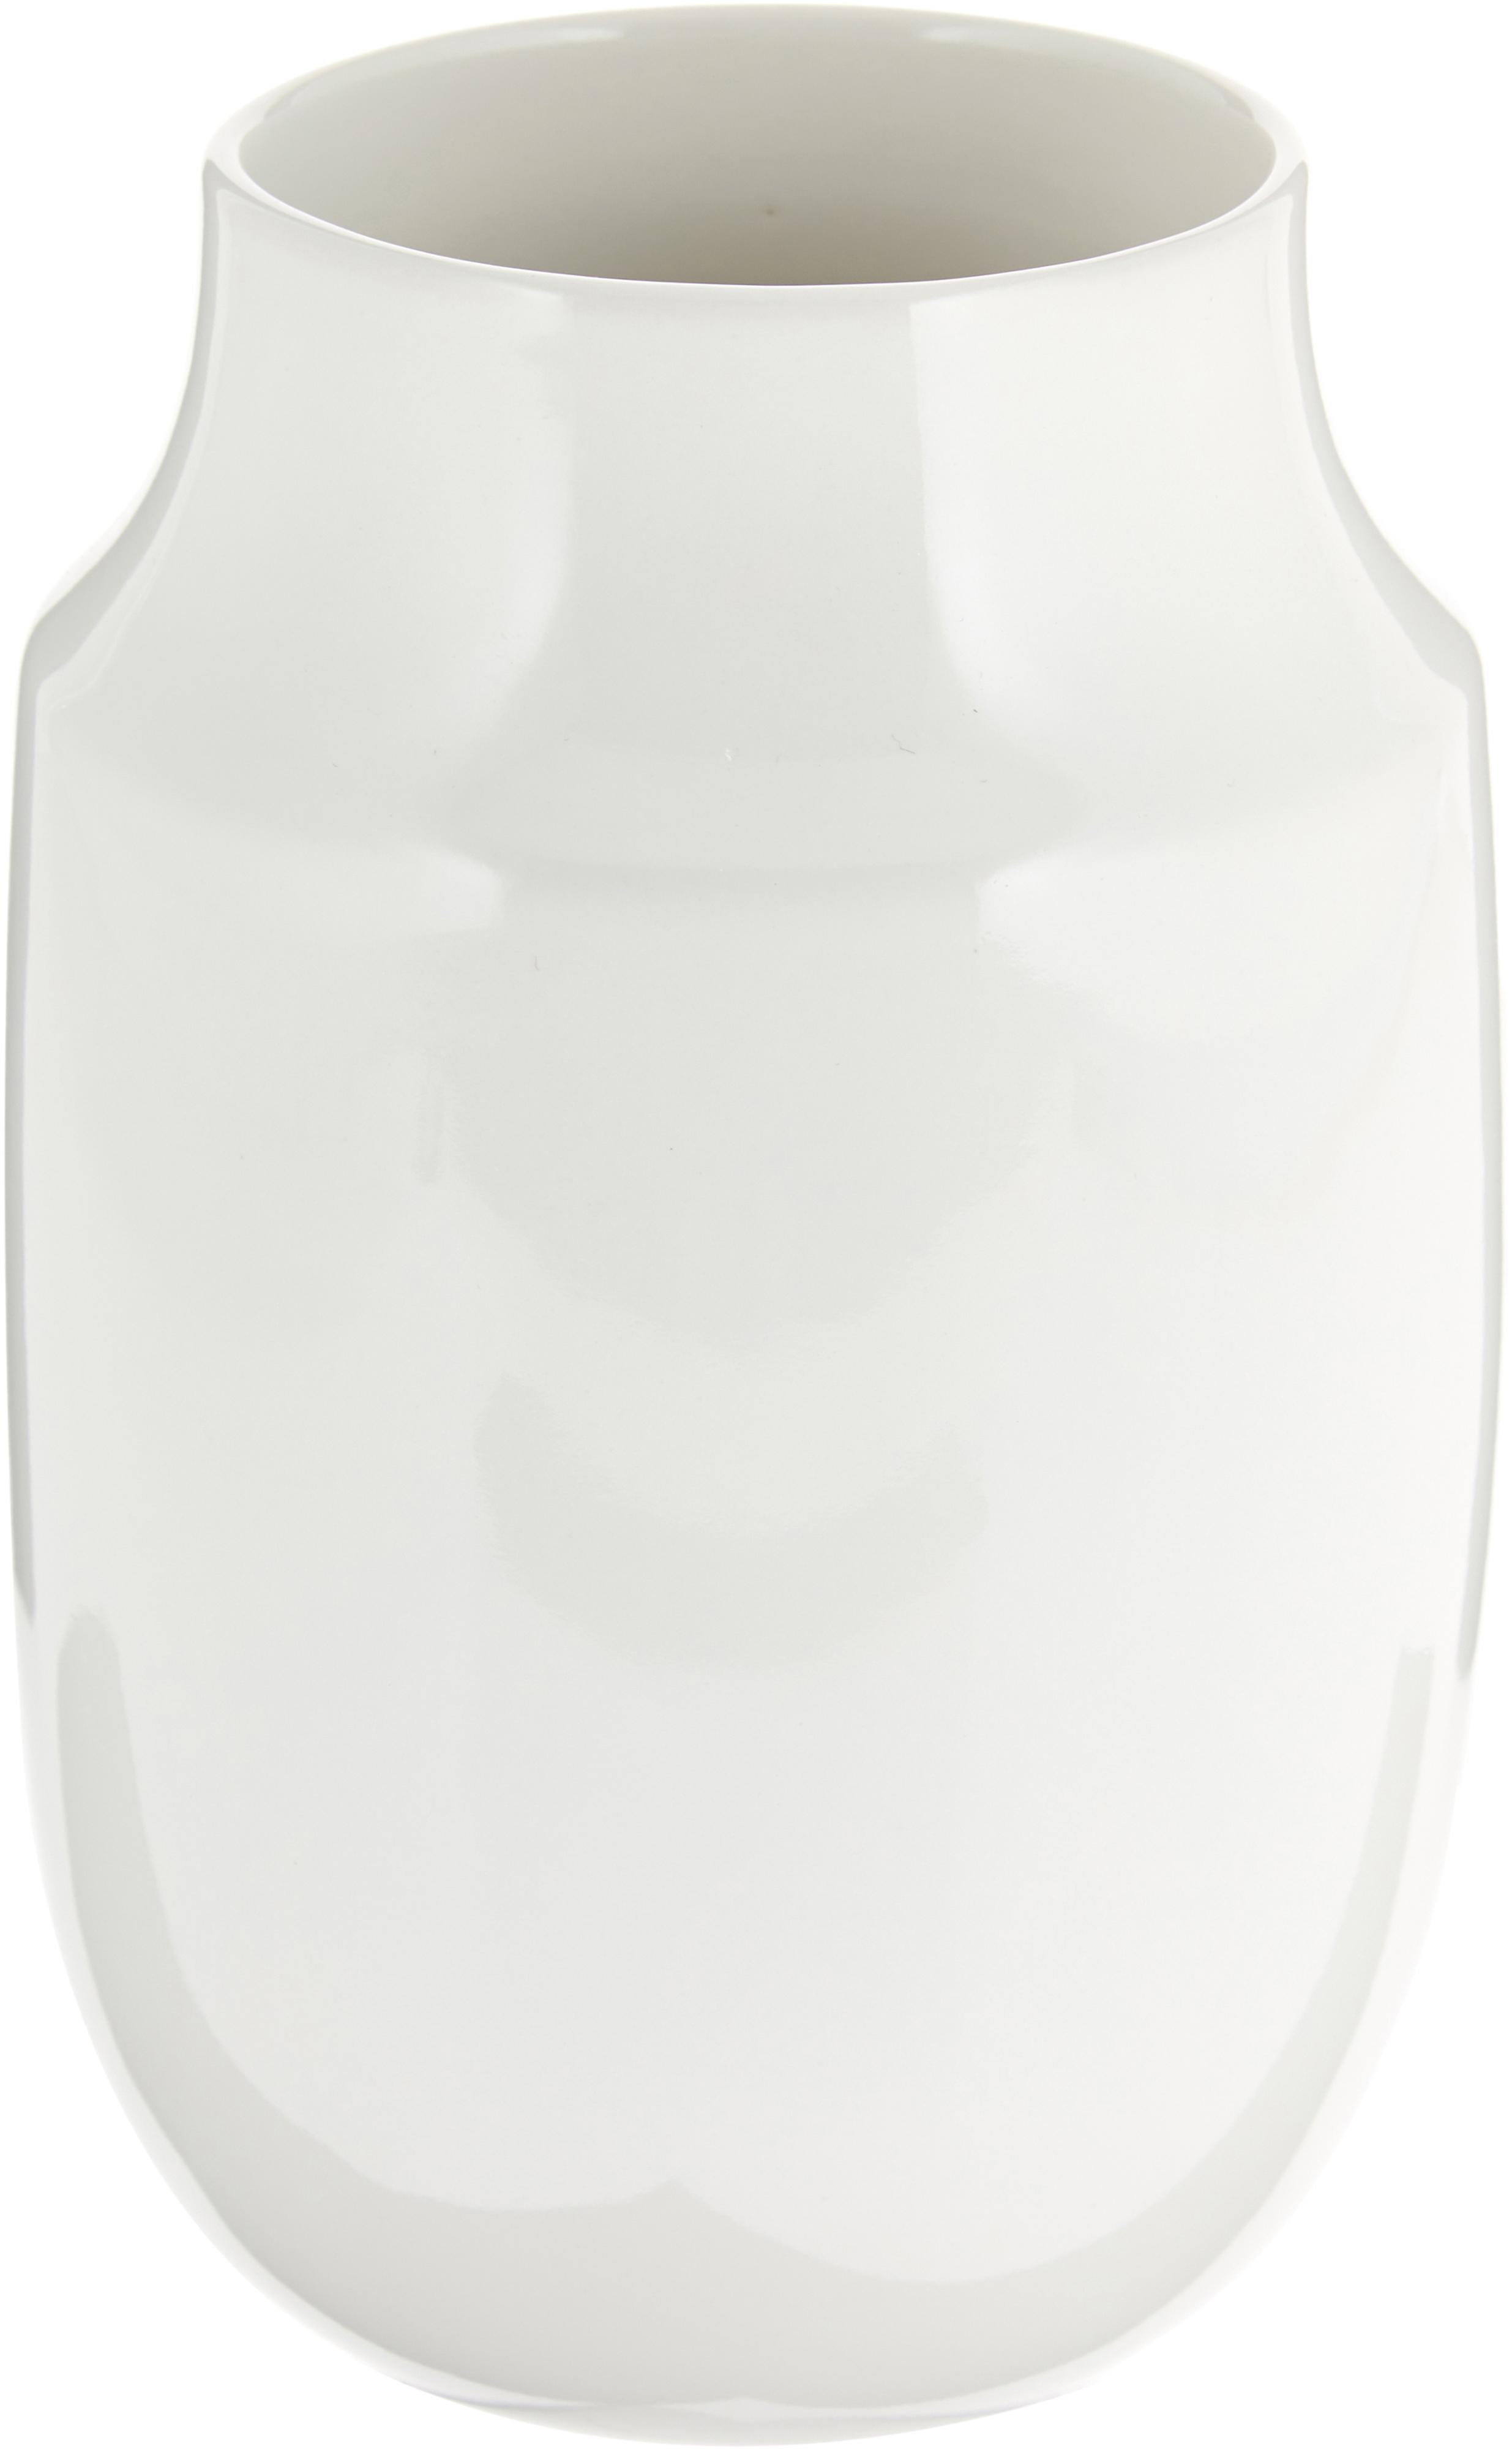 Jarrón artesanal Valeria, Cerámica, Blanco brillante, Ø 13 x H 20 cm